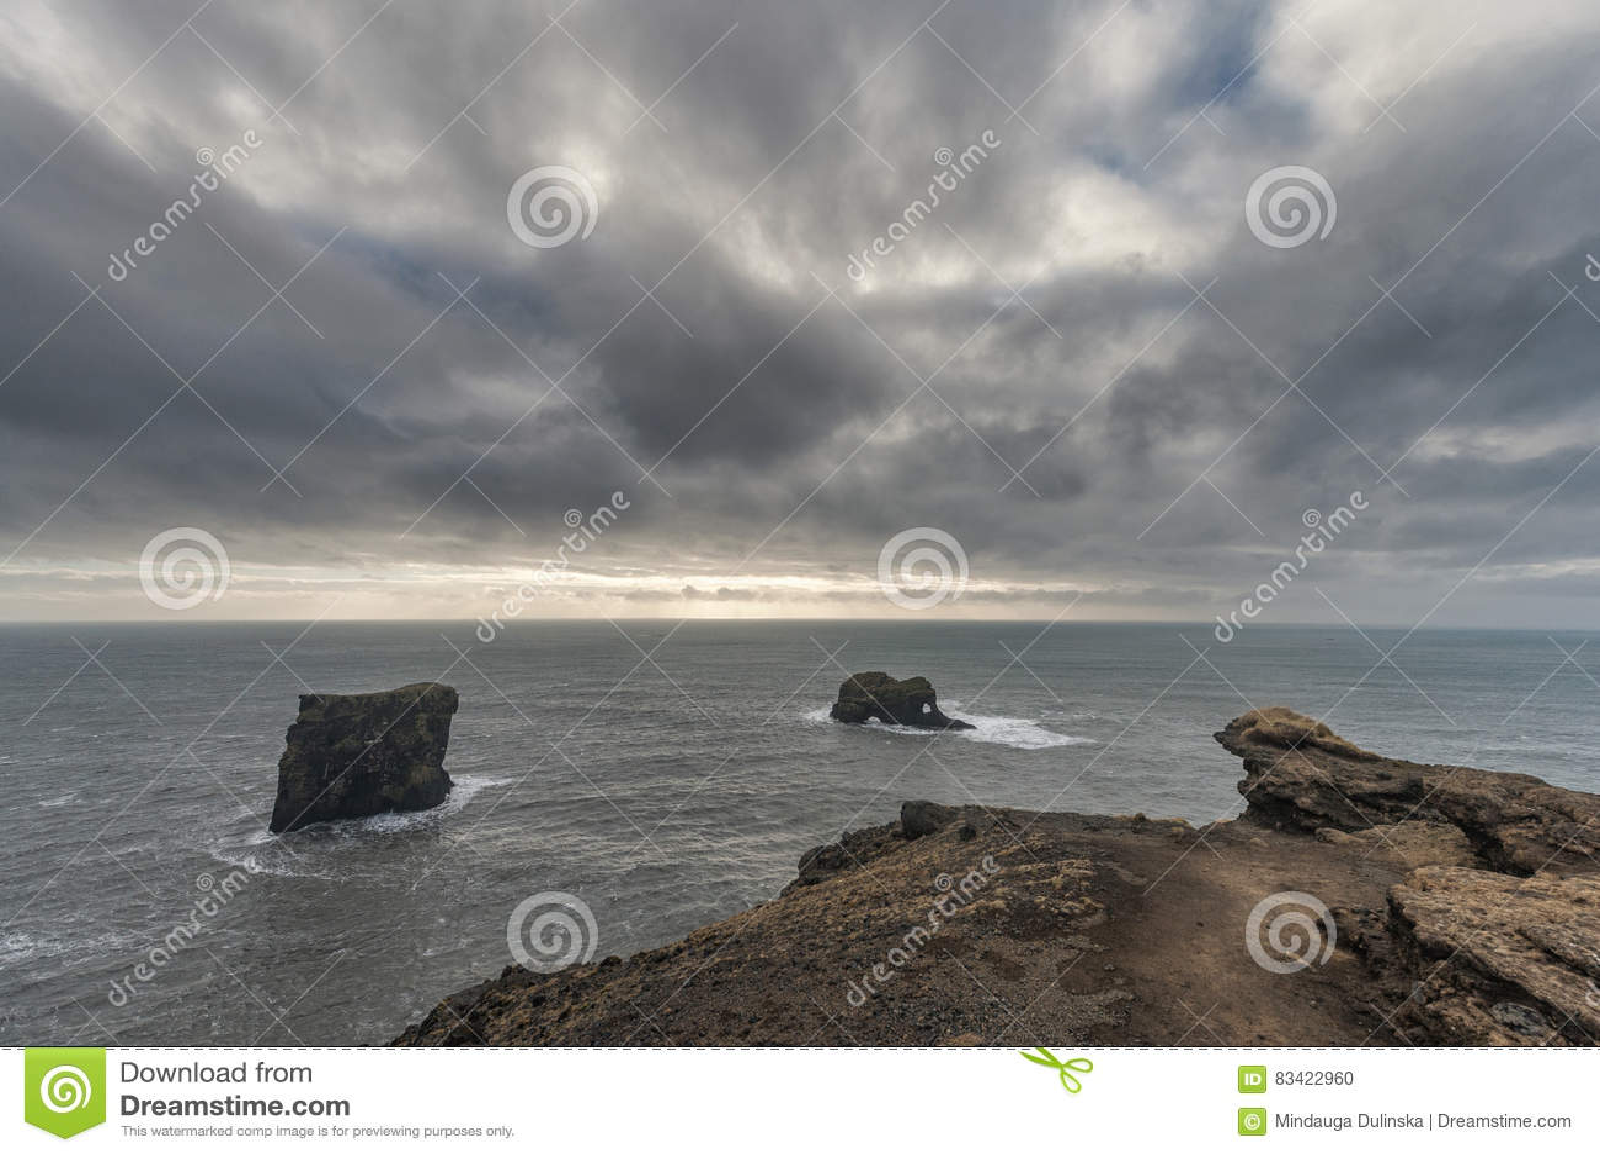 Dyrholaey Area in Iceland. Close to Black Sand Beach. Cloudy Sky